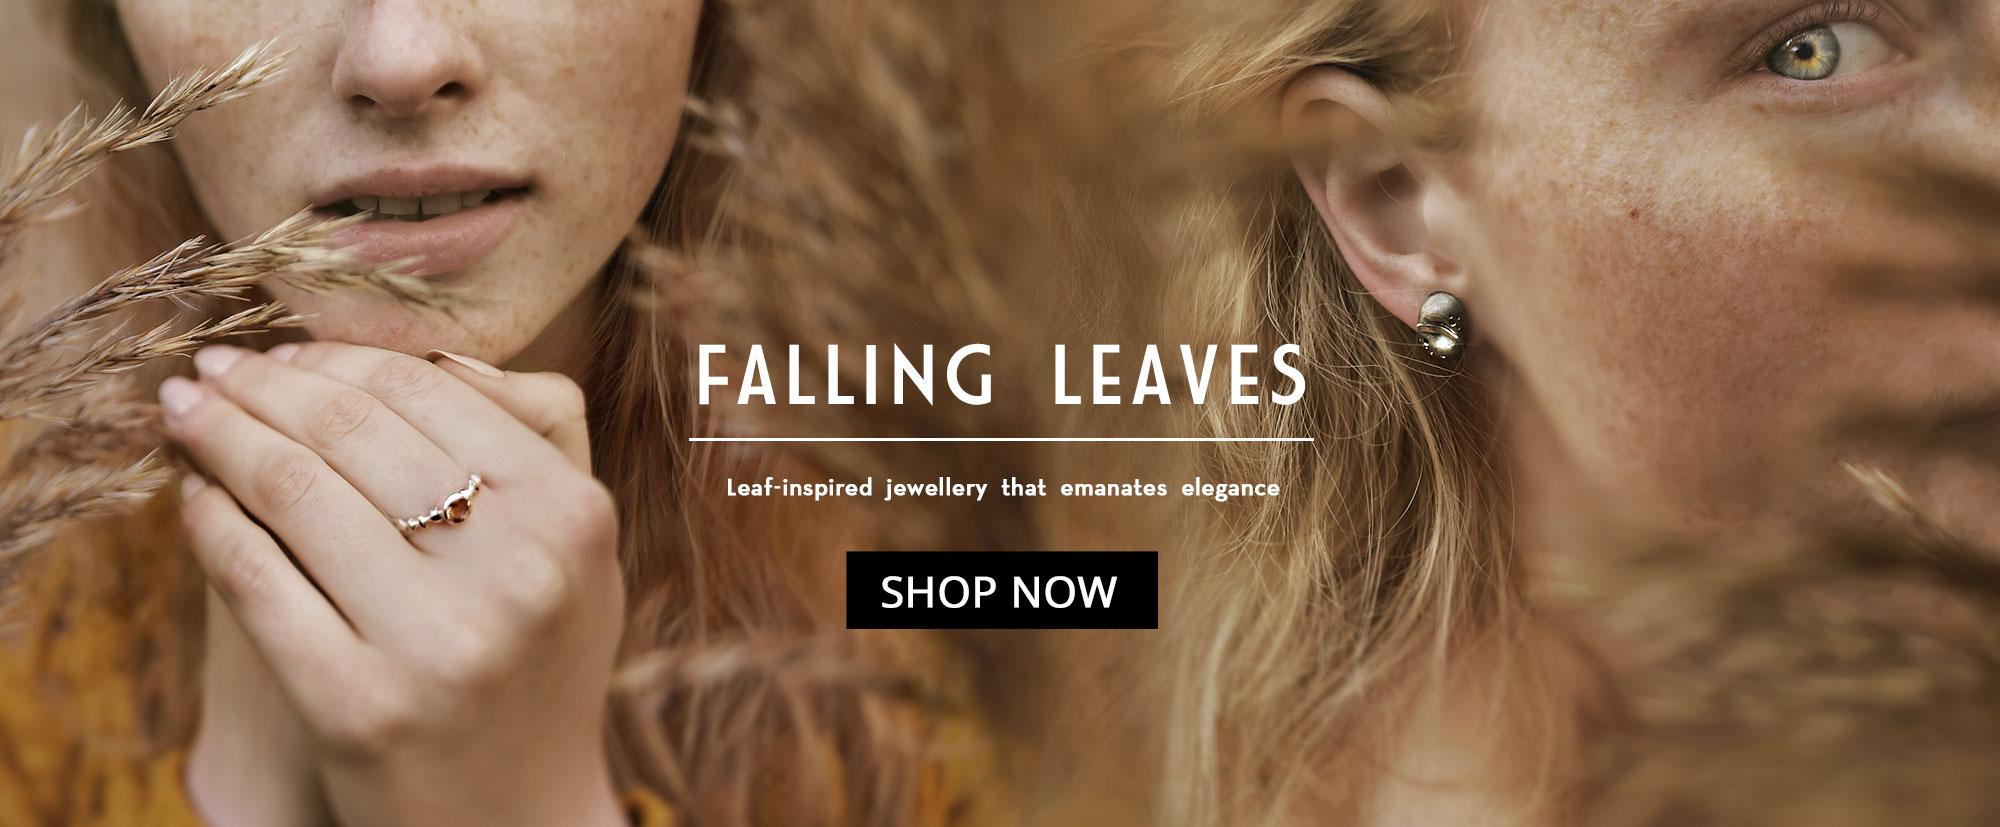 Leaf-inspired Jewellery